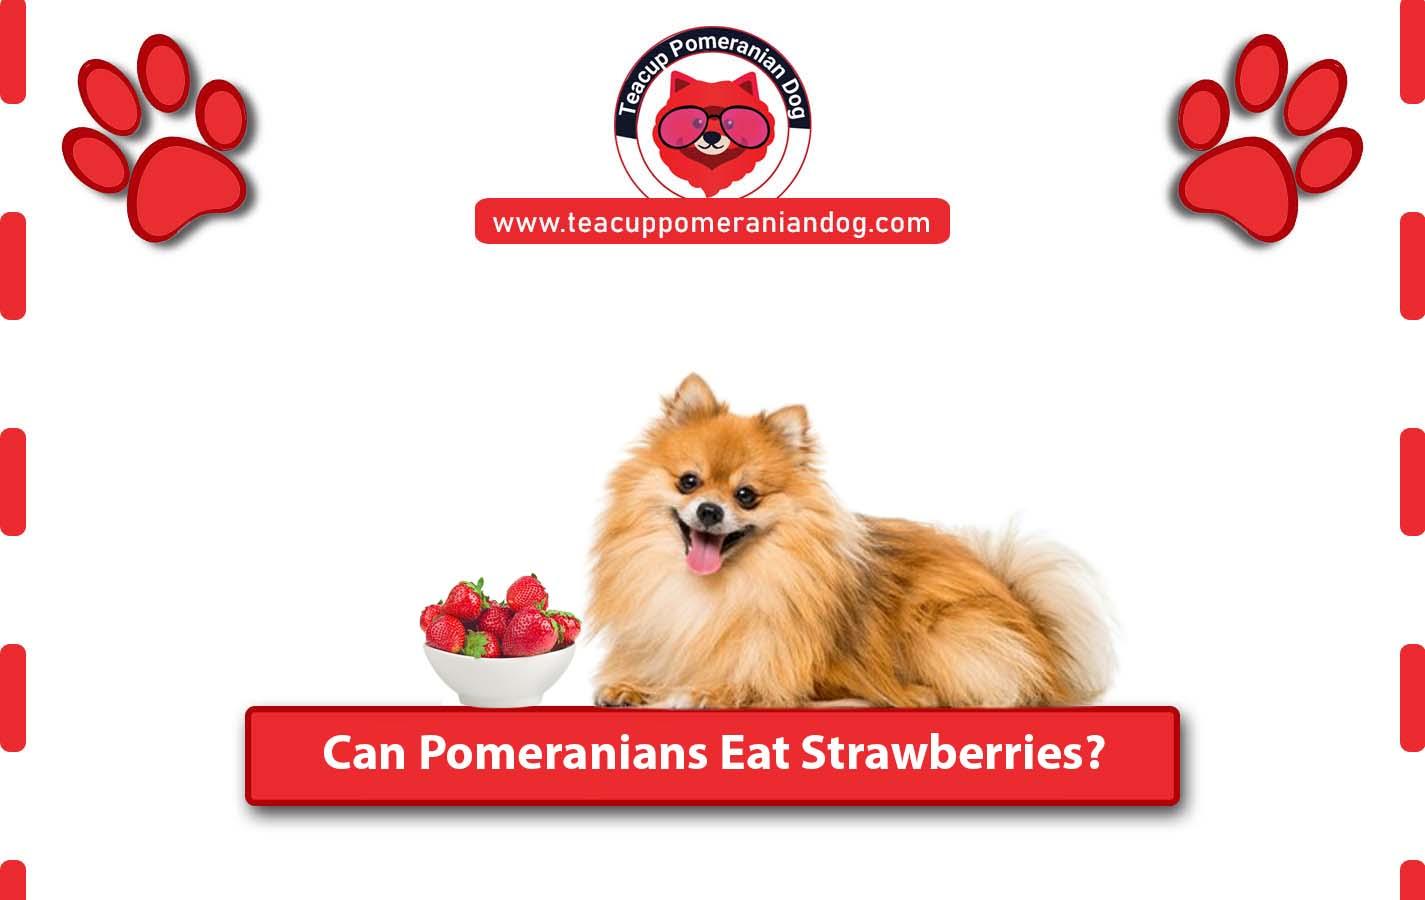 Can Pomeranian Eat Strawberies